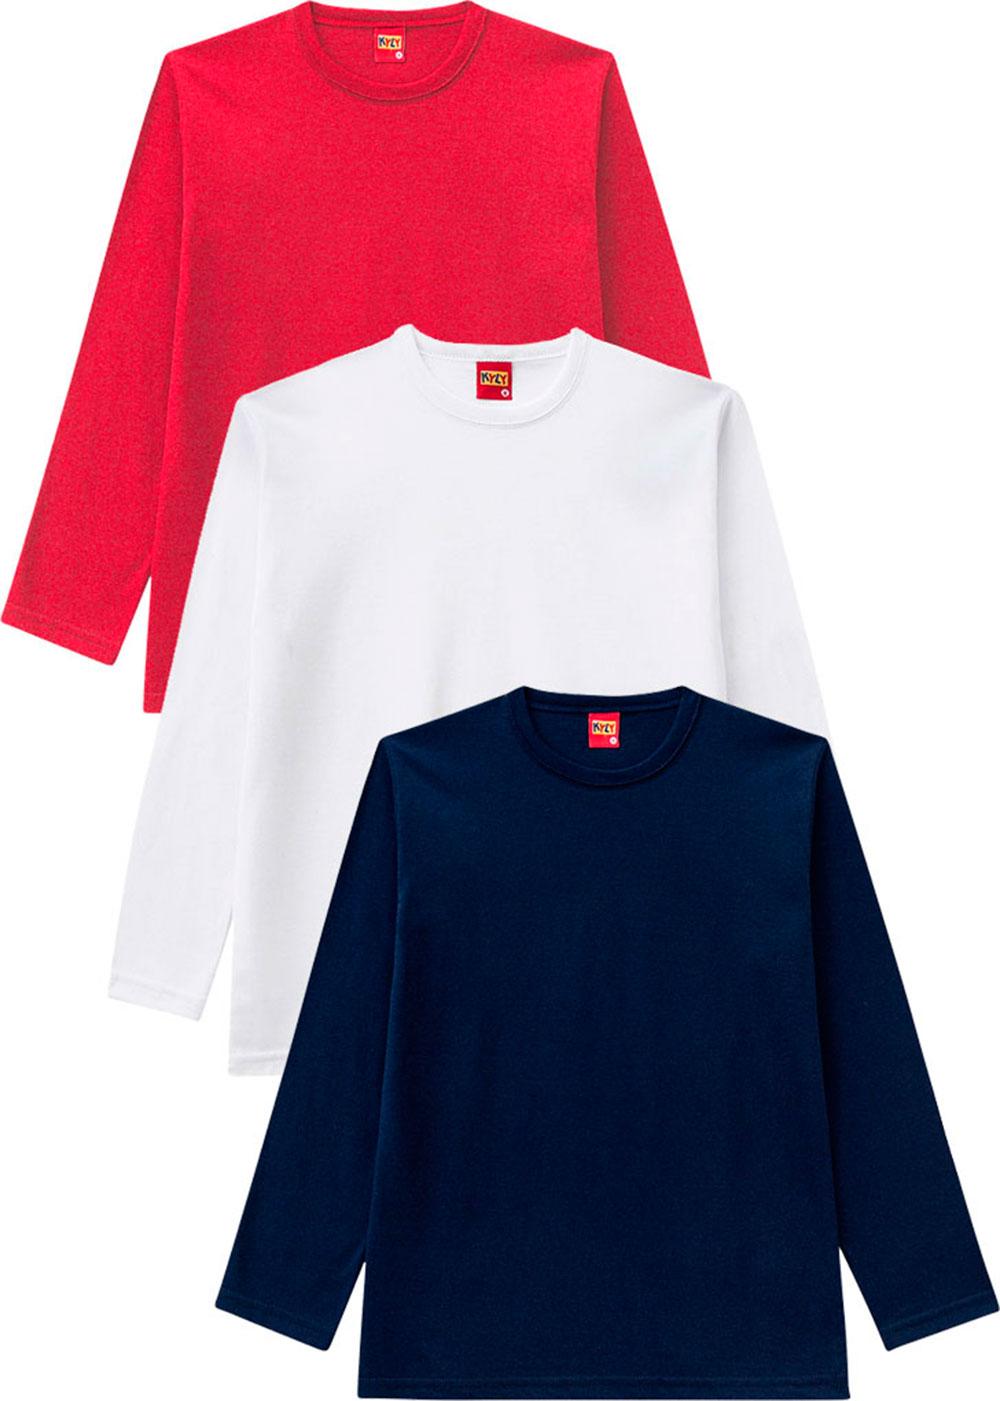 Camiseta Infantil Masculina Kit 3 Vermelho - Kyly